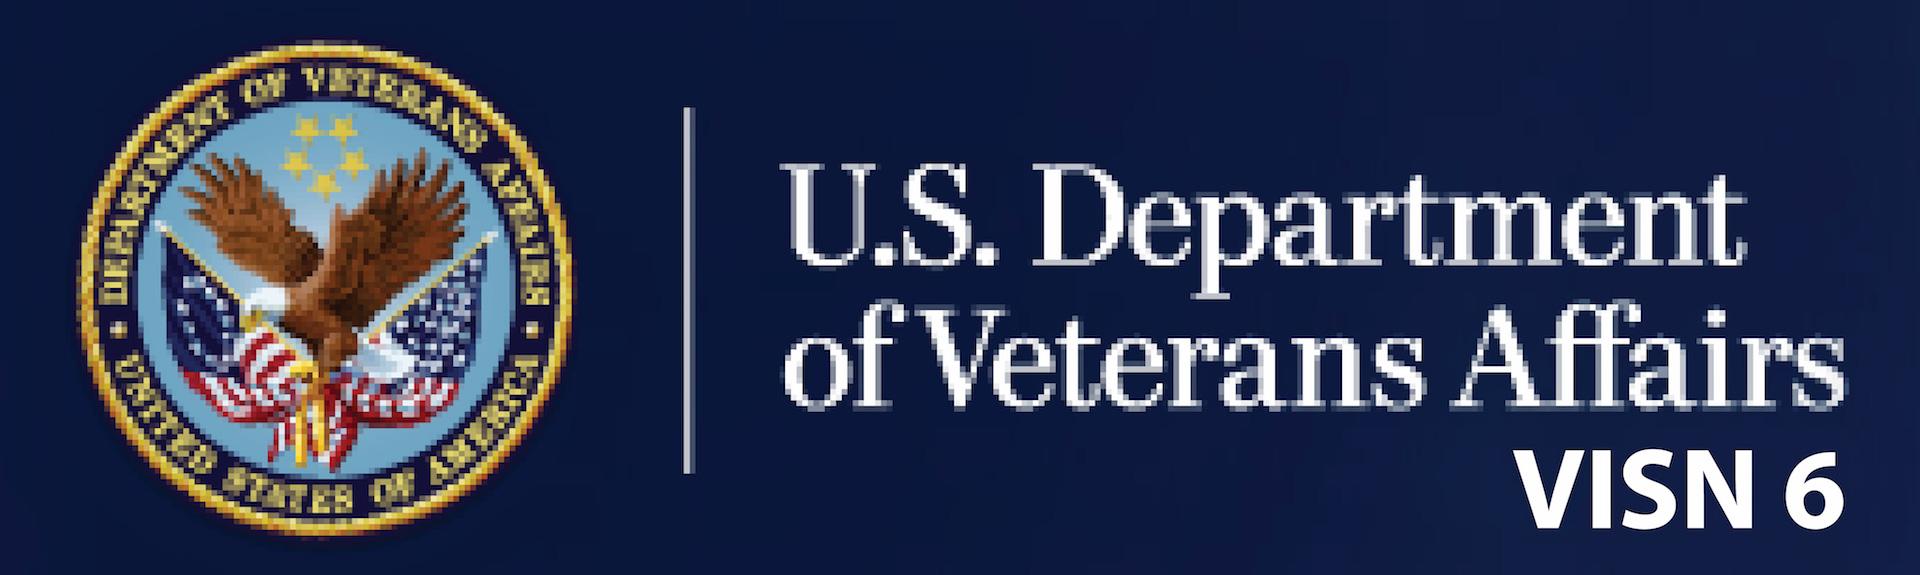 U.S. Department of Veterans Affairs Logo: VISN 6